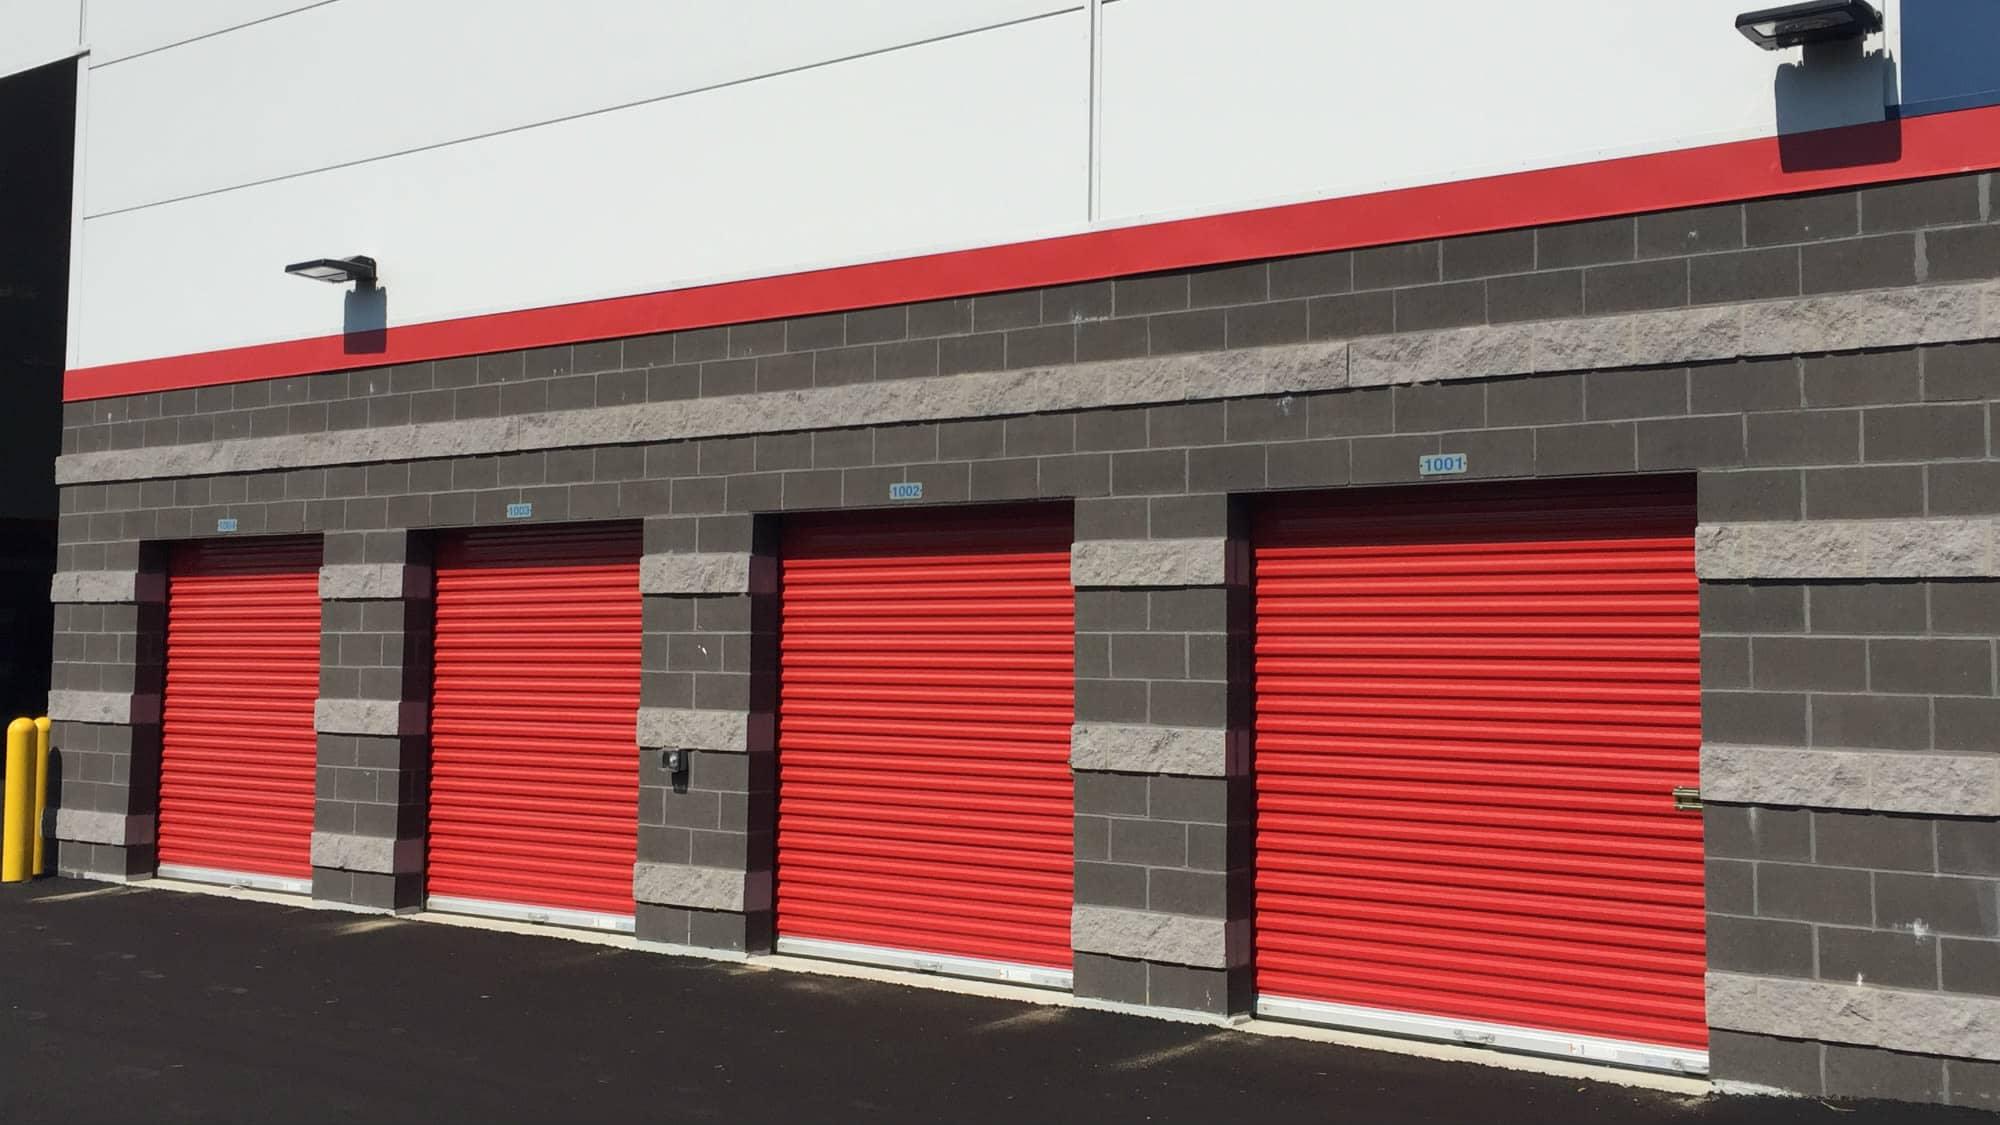 Drive up units at Self Storage Plus